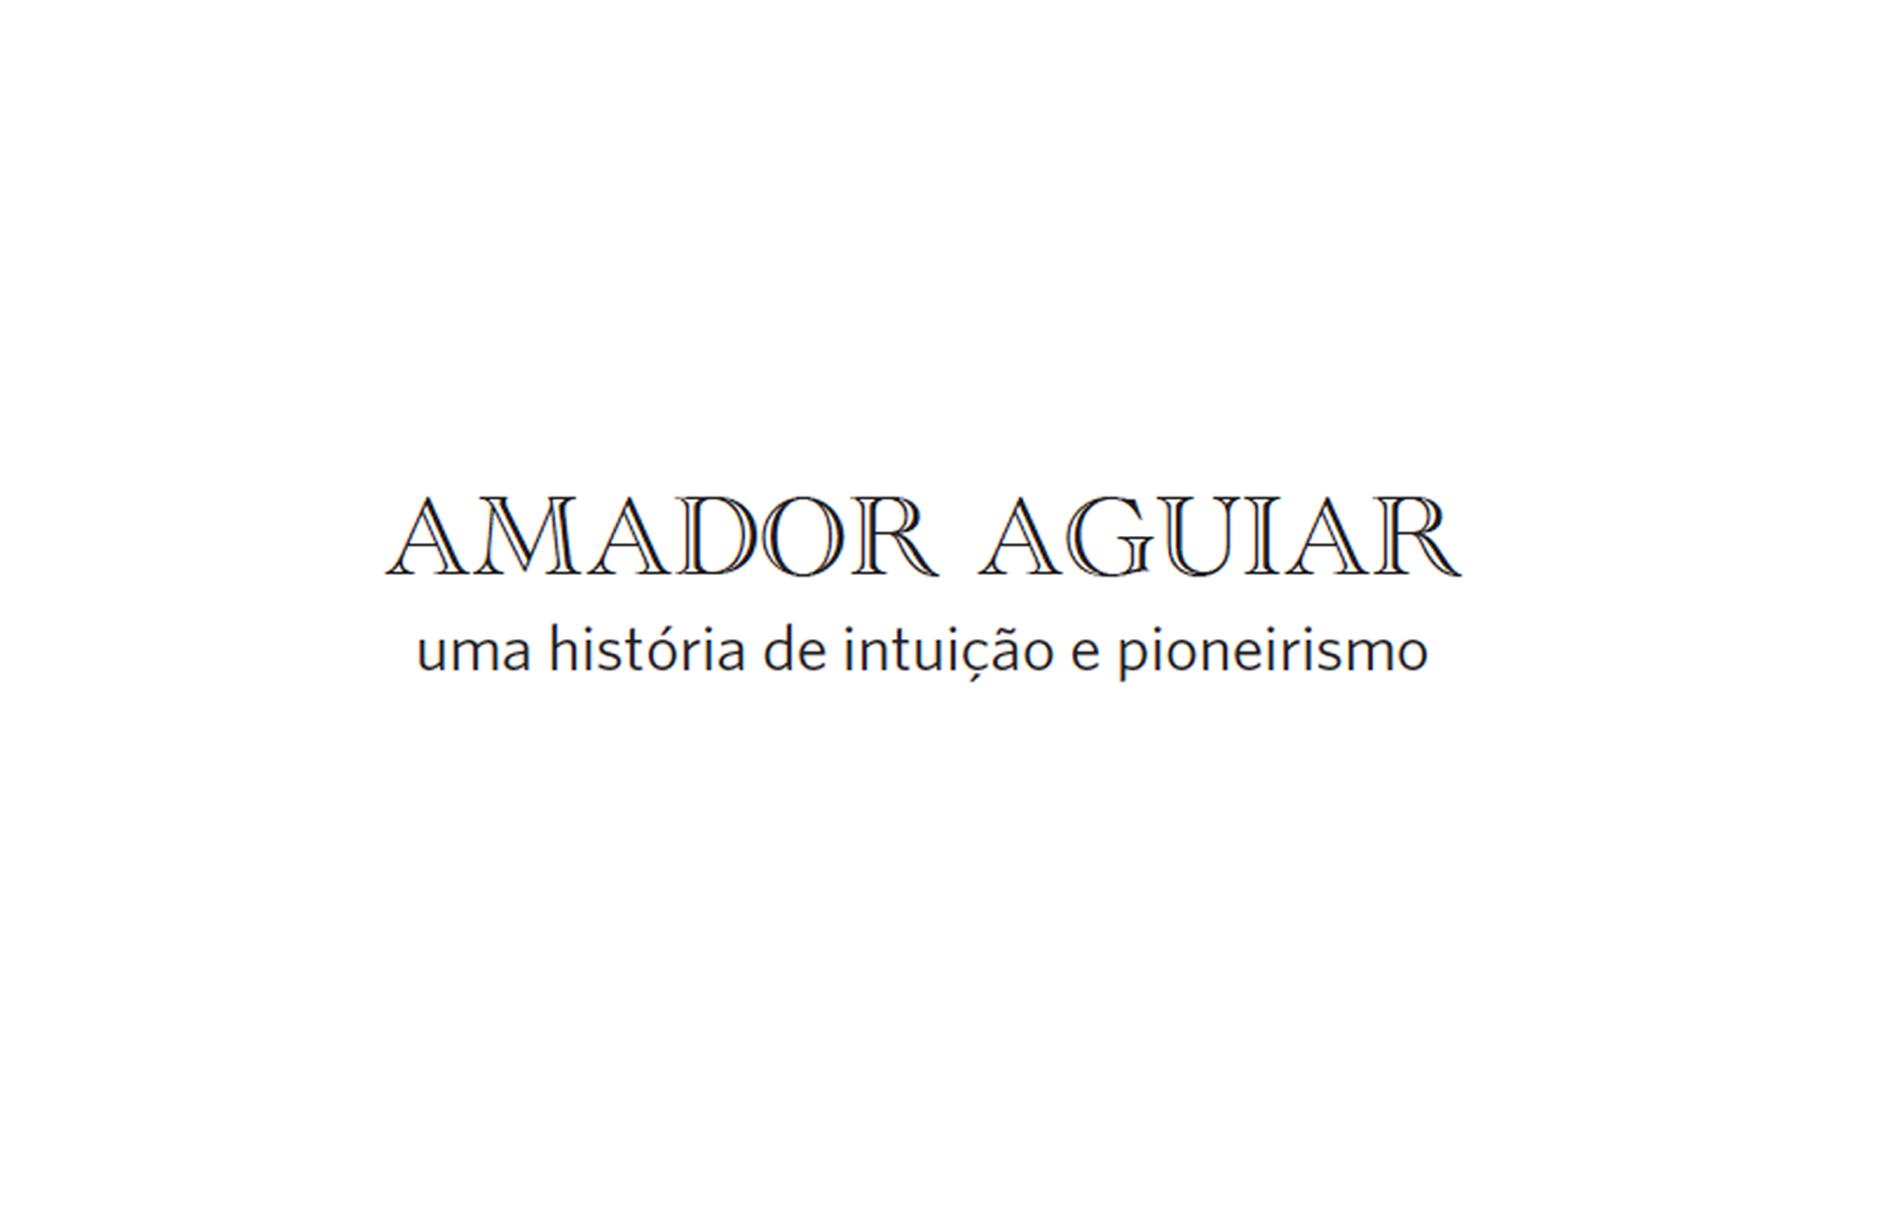 Amador Aguiar